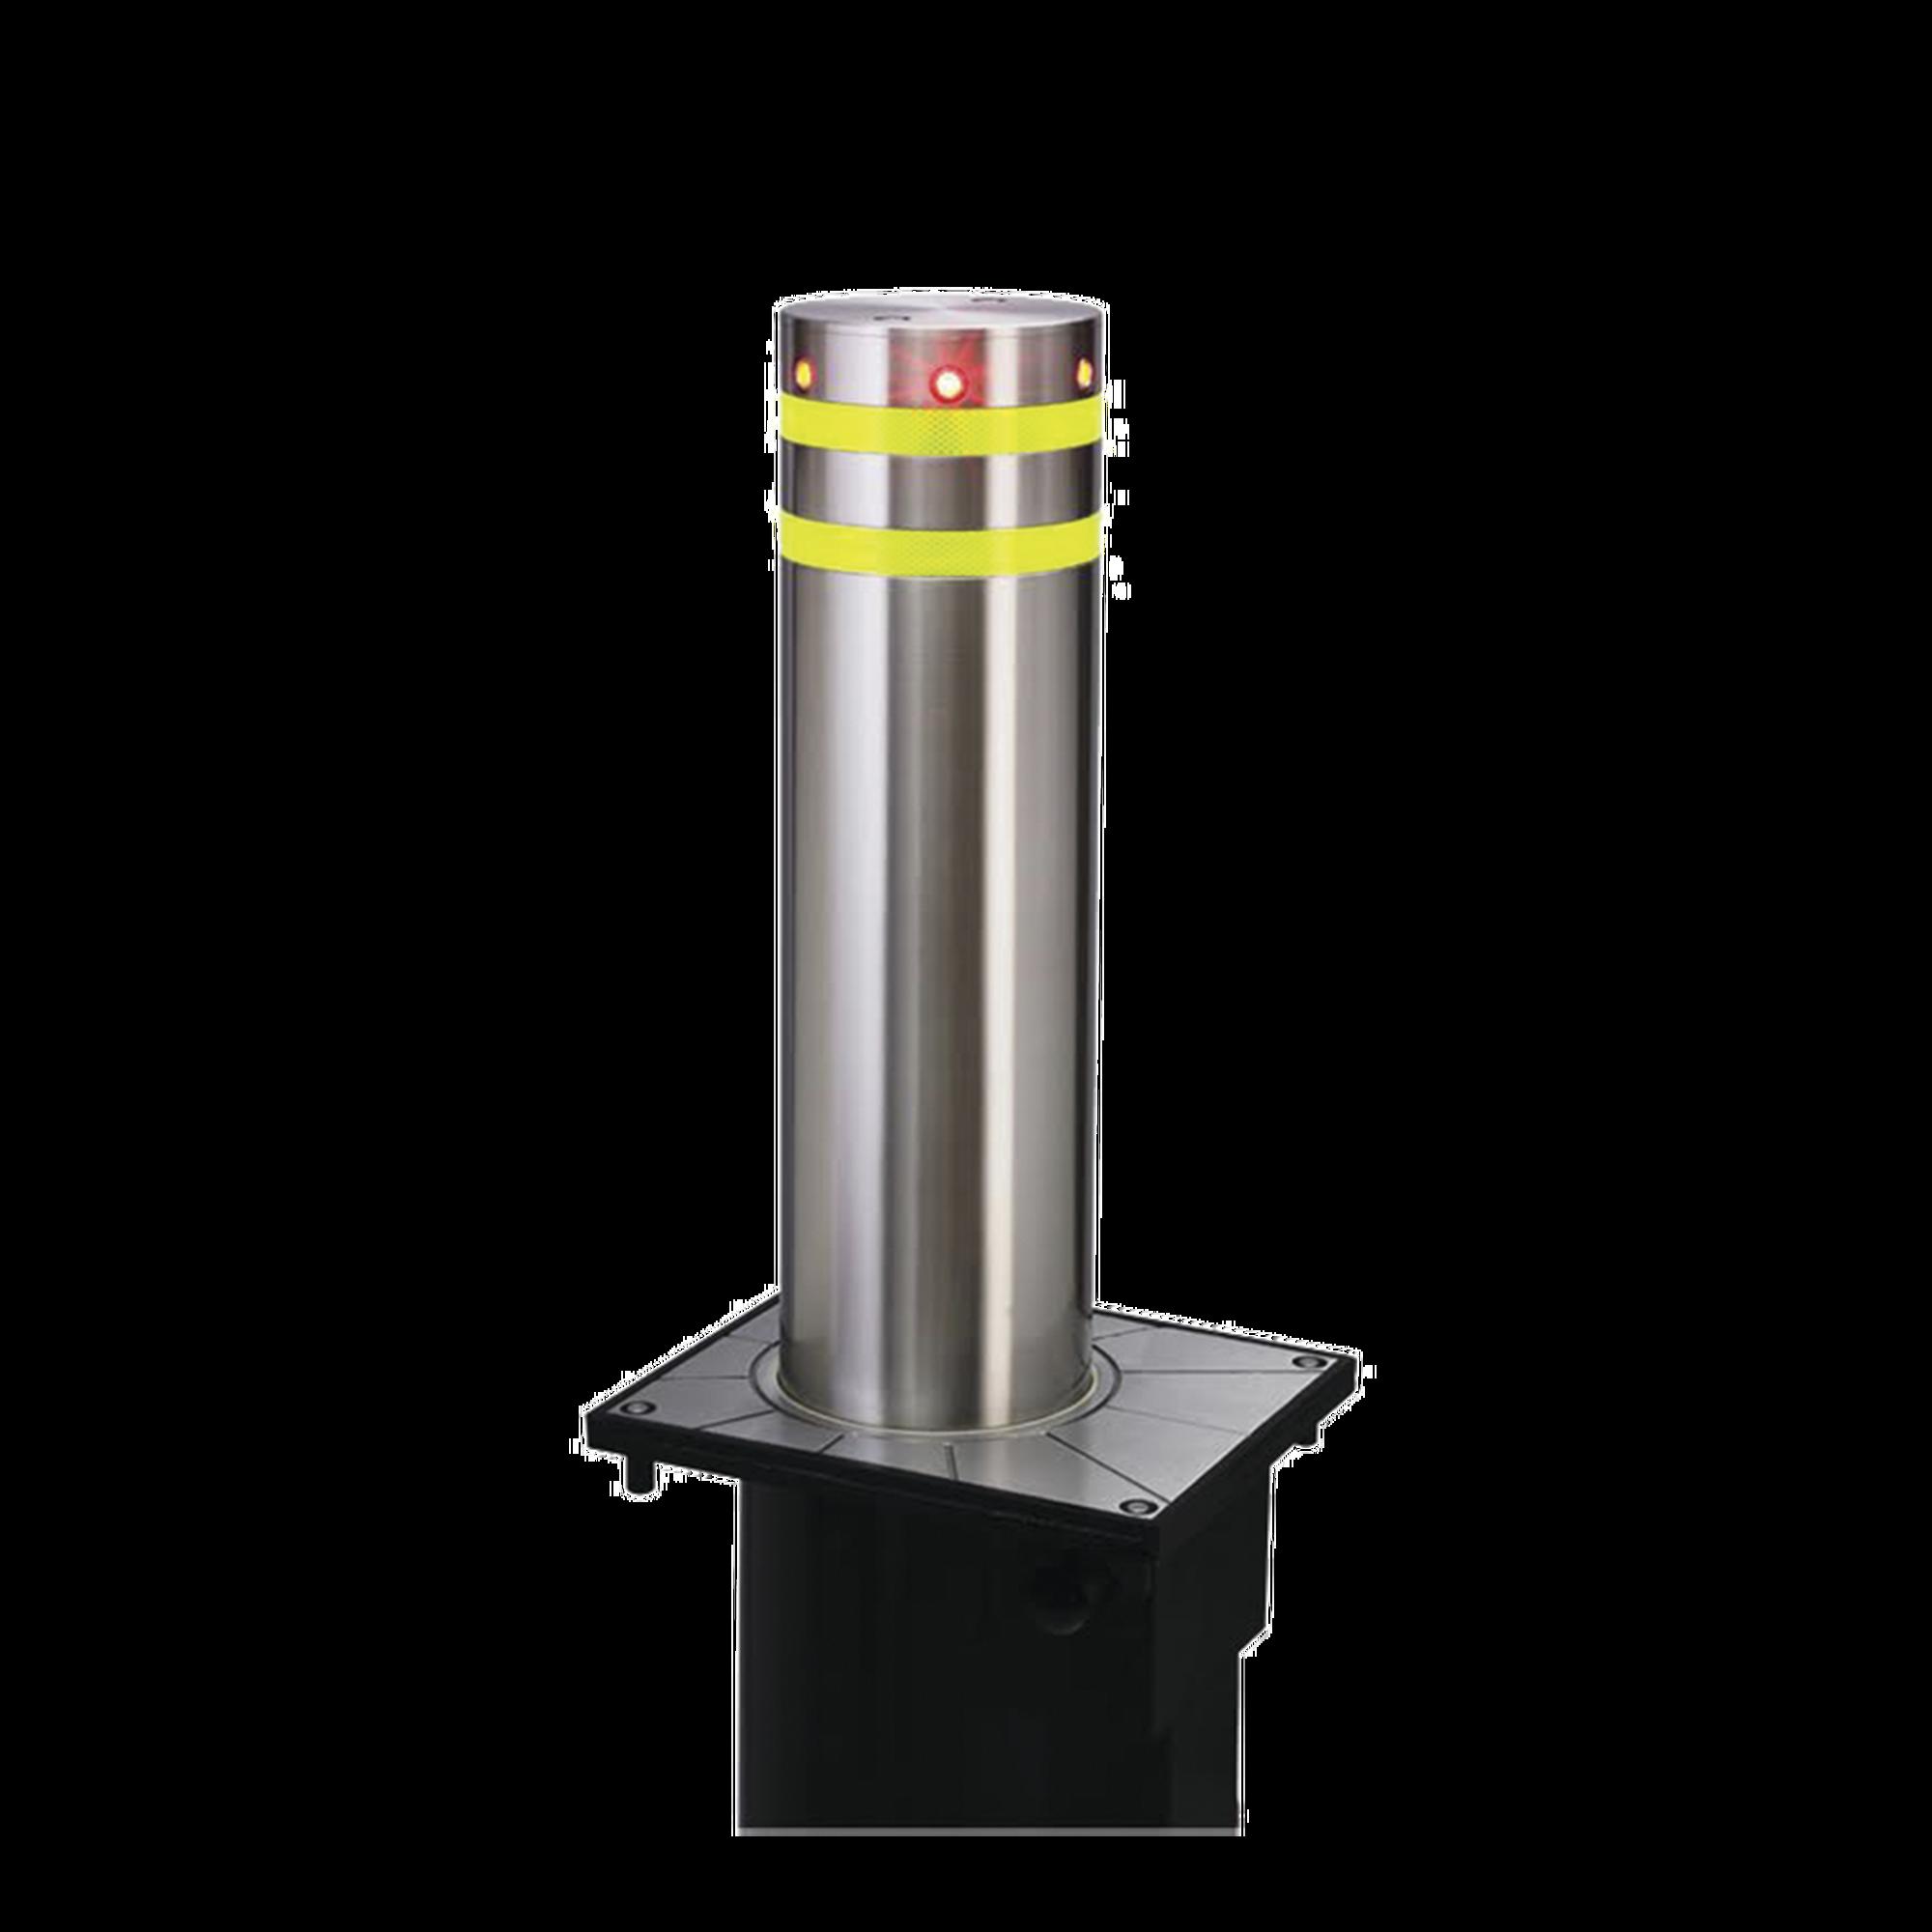 Pilona o Bolardo Neumatico / 100% Acero Inoxidable / Alta Velocidad / 275MM Diametro / Acabado de Lujo